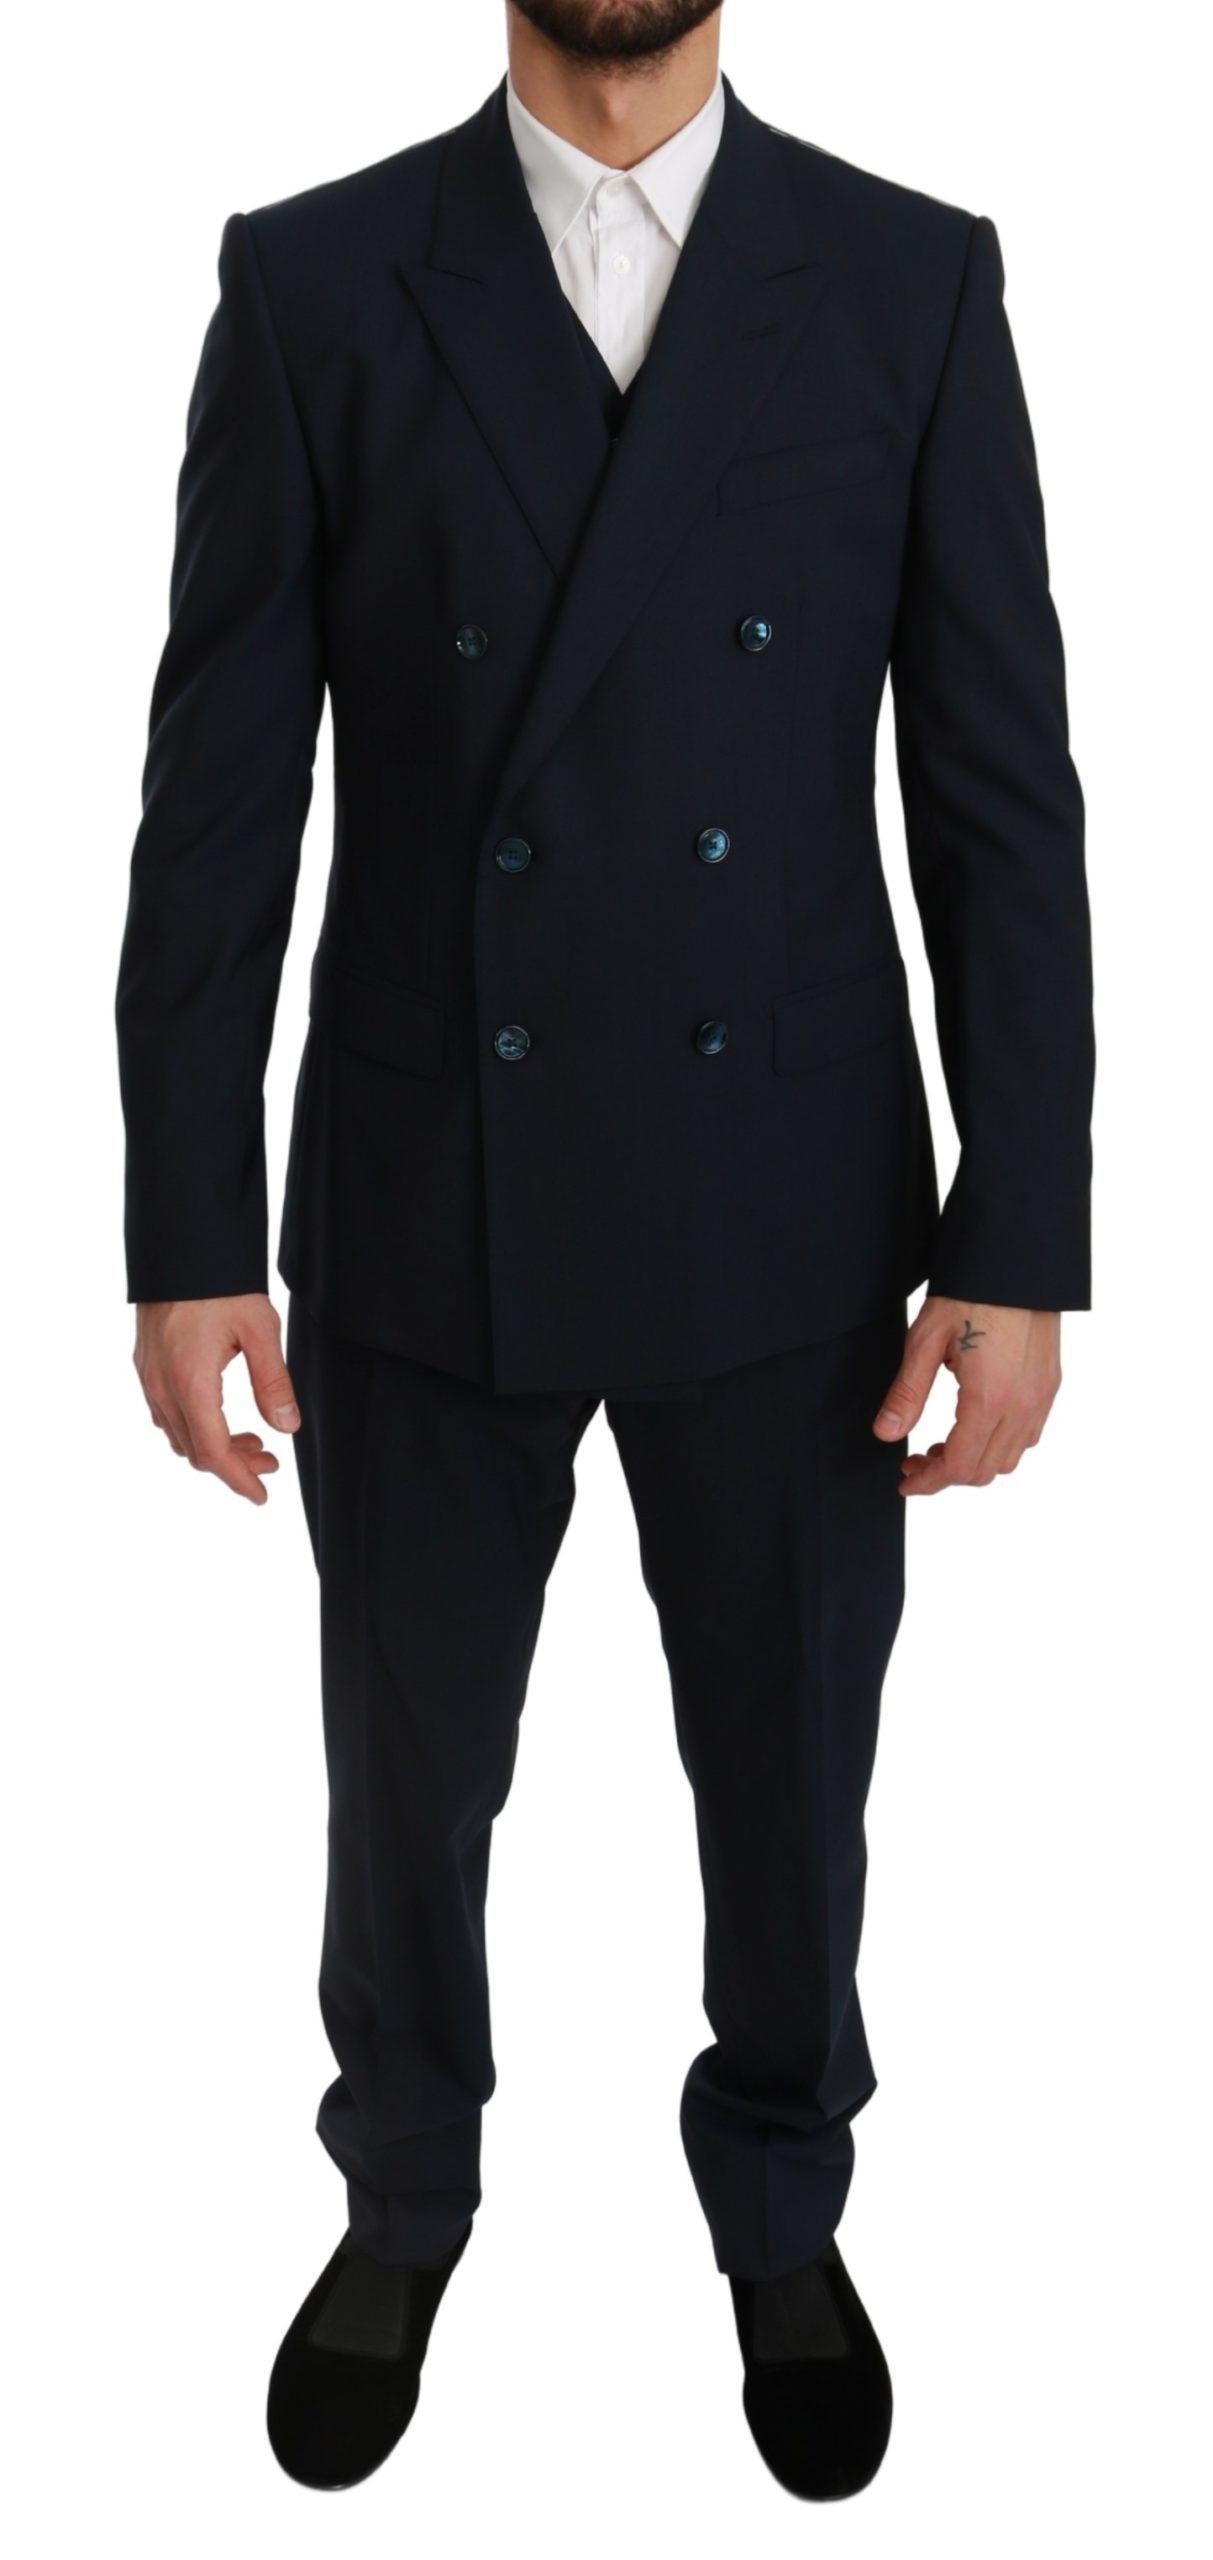 Dolce & Gabbana Men's Slim Fit 3 Piece MARTINI Wool Suit Blue KOS1765 - IT50 | L